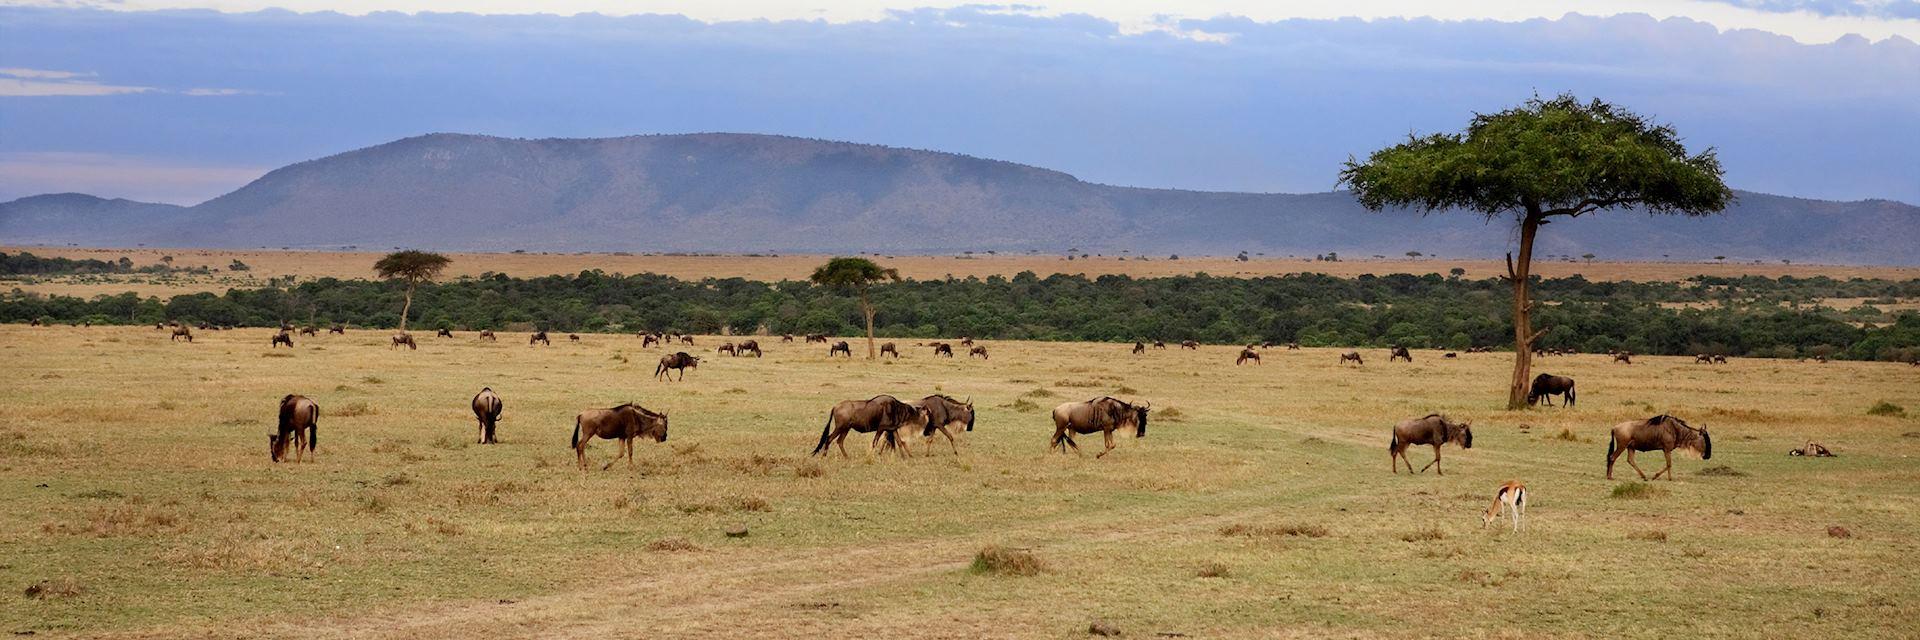 Wildebeest herd, Masai Mara